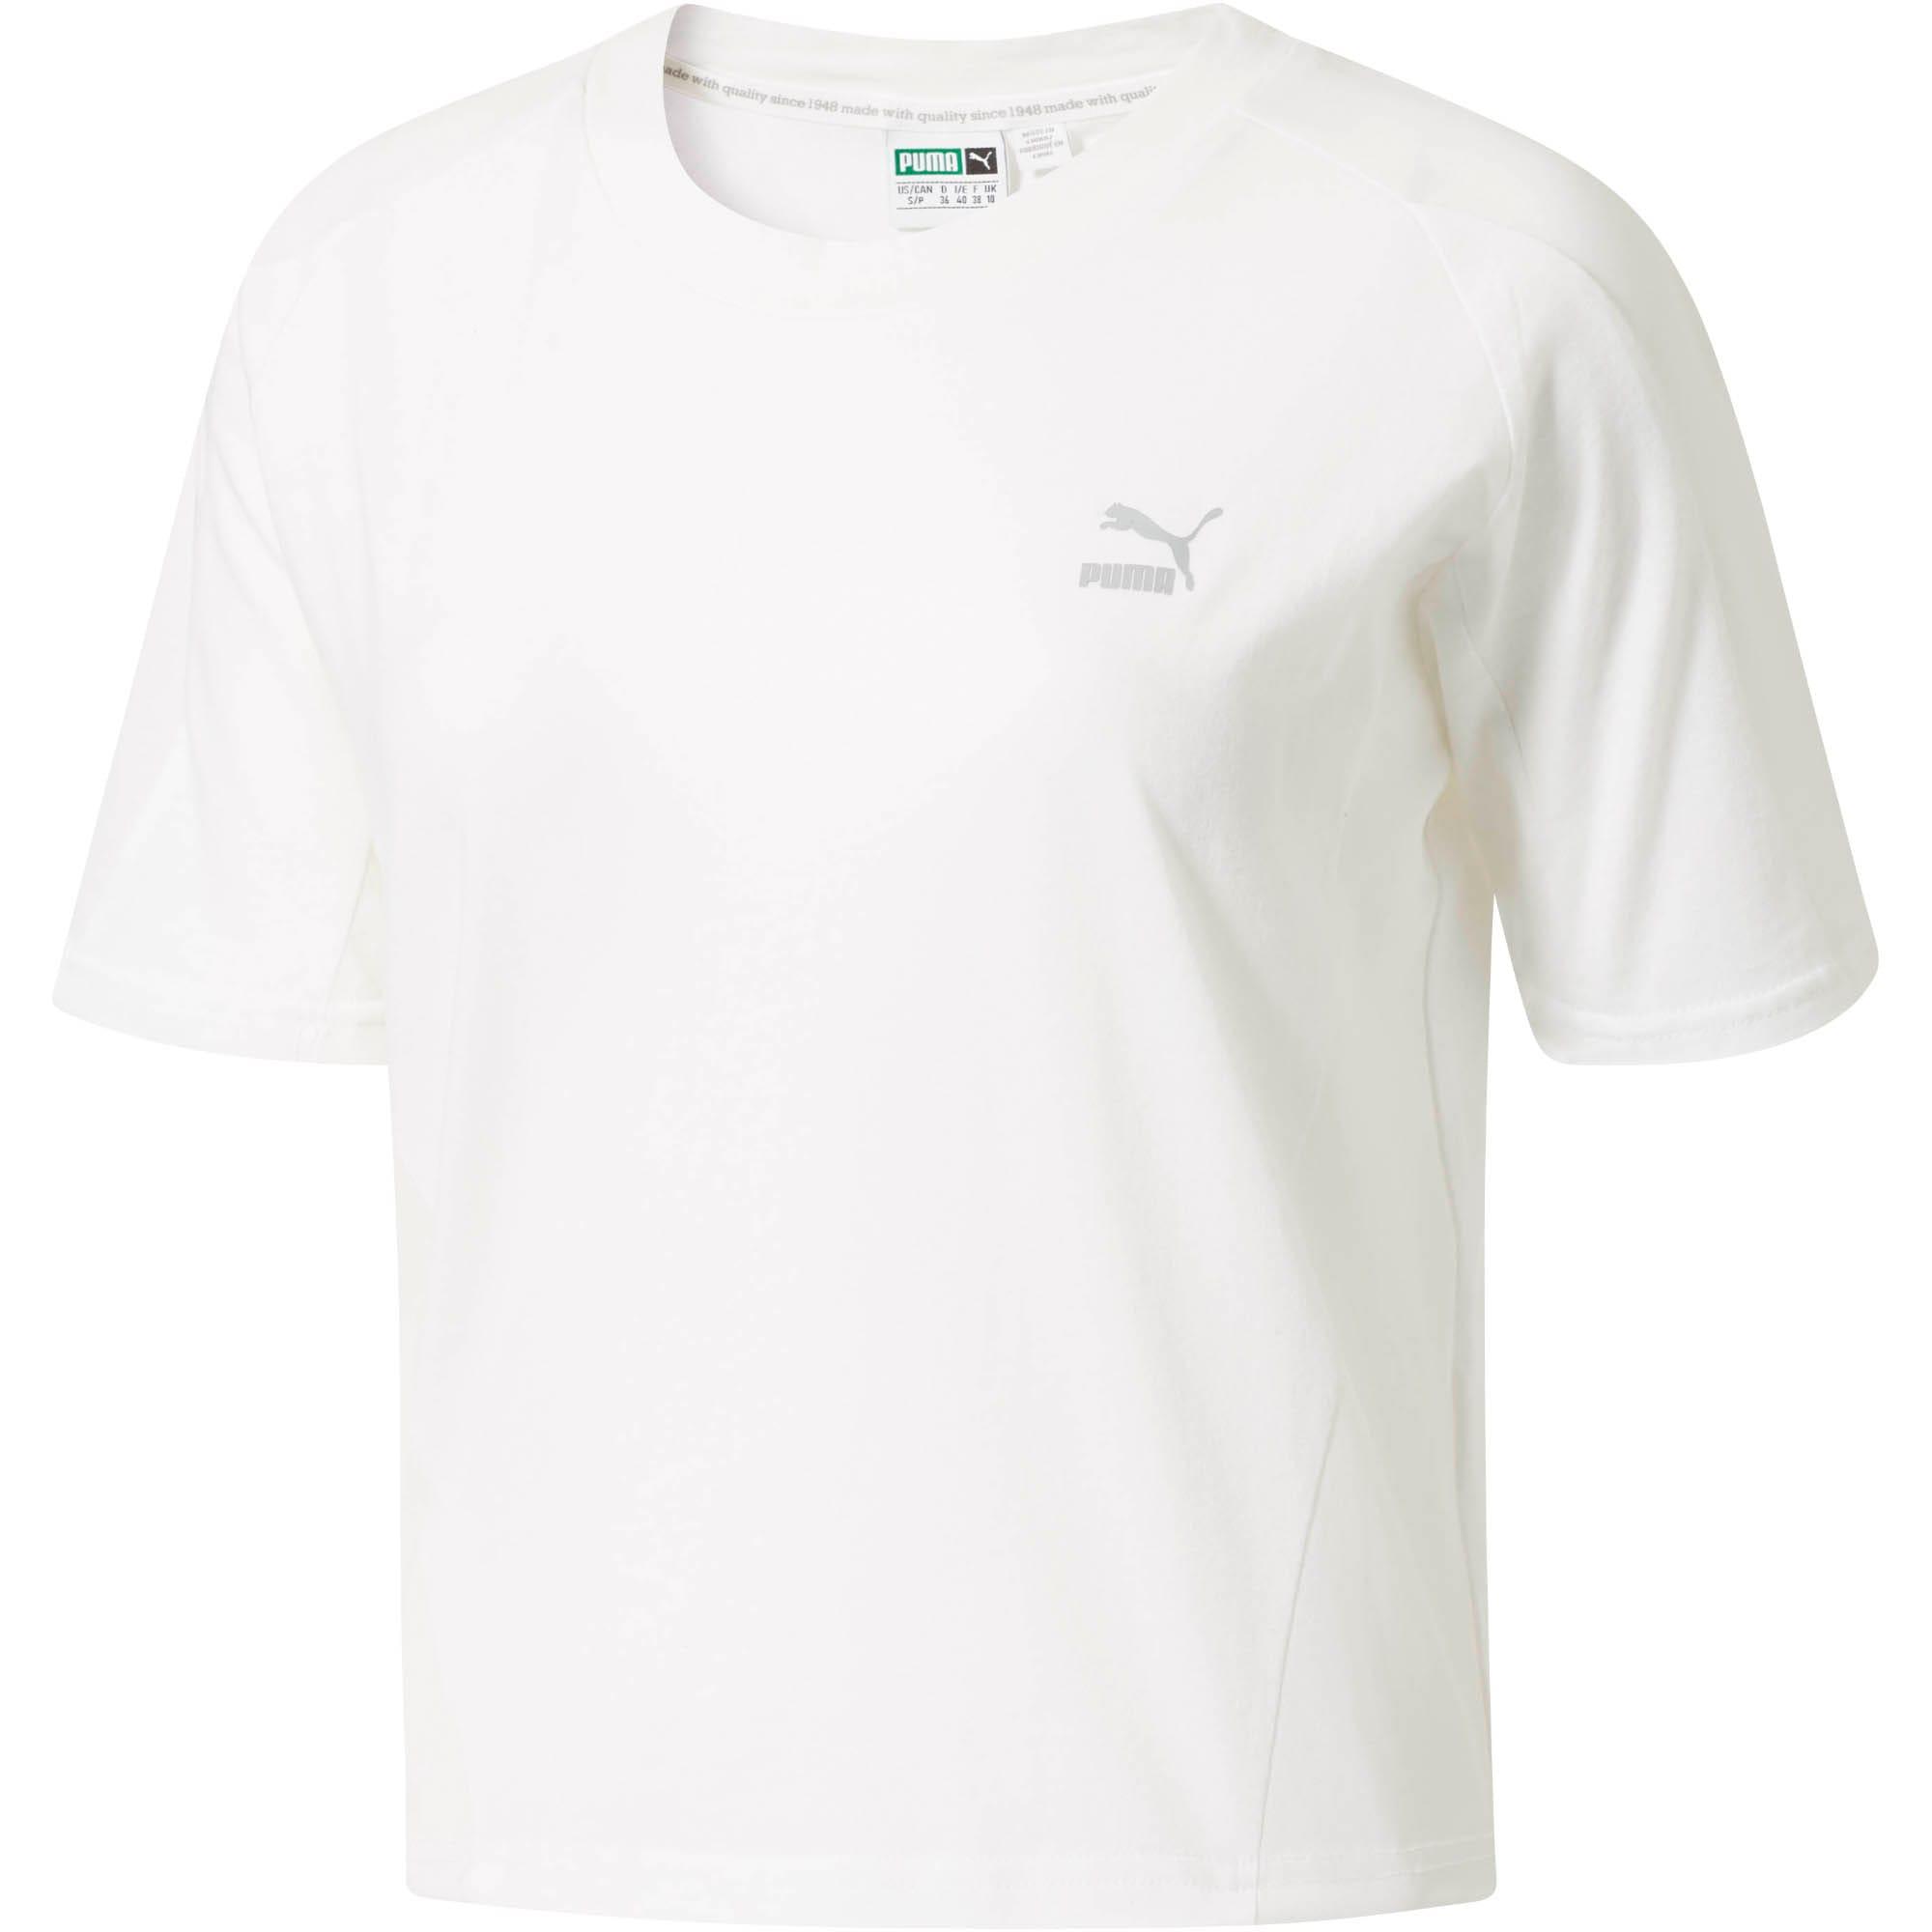 Thumbnail 1 of Archive T-Shirt, Puma White, medium